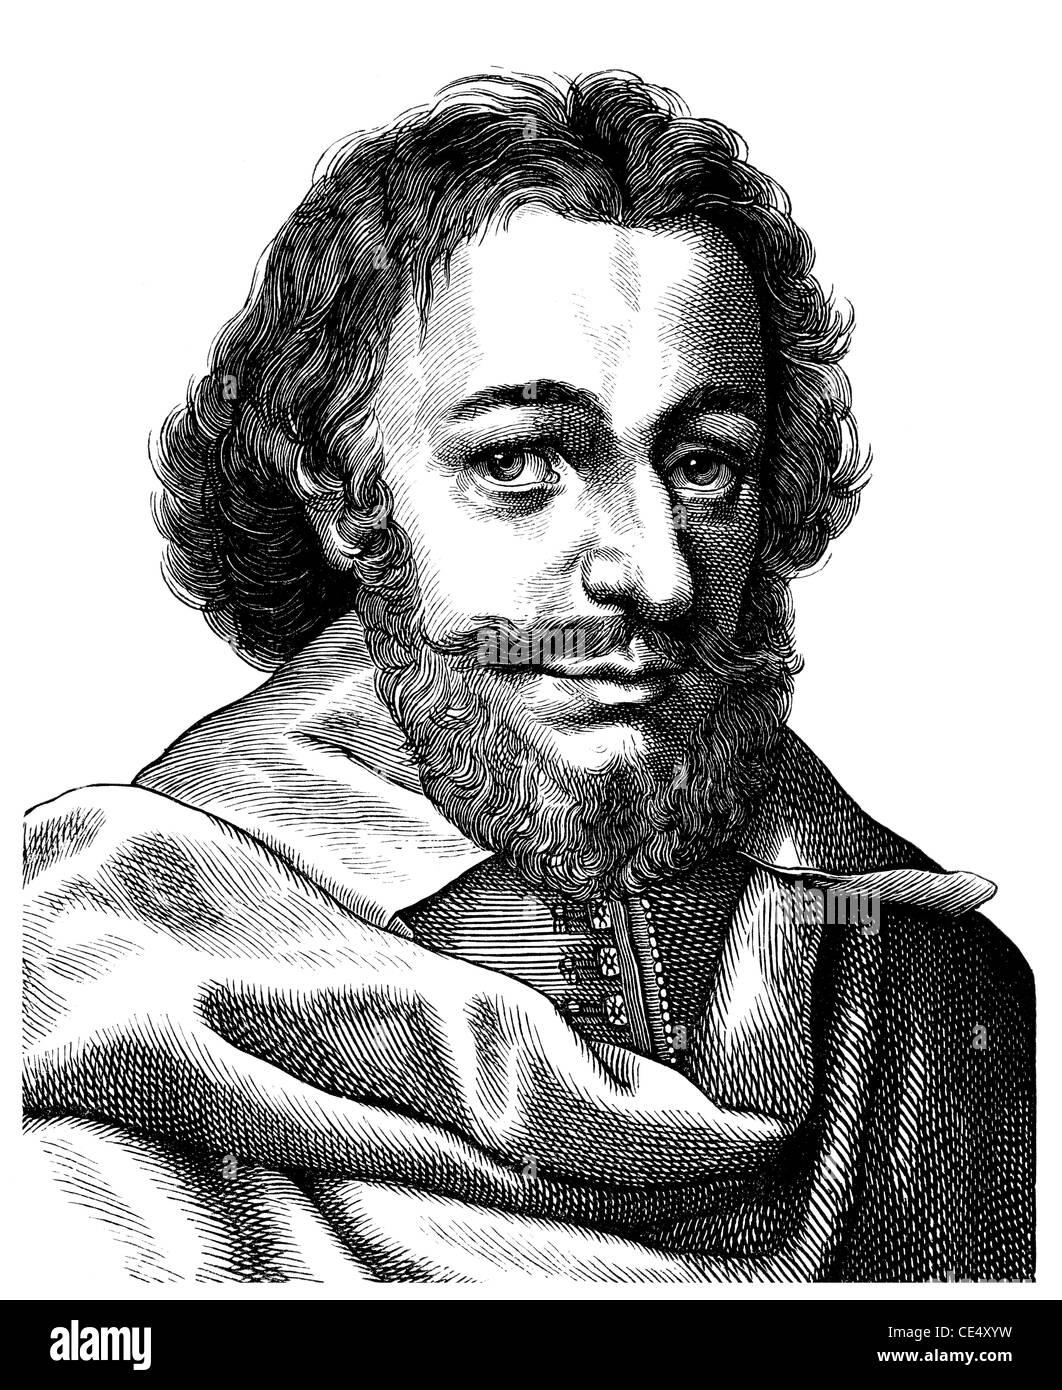 Matthaeus Merian the Elder, 1593-1650, Swiss-German engraver and publisher Stock Photo